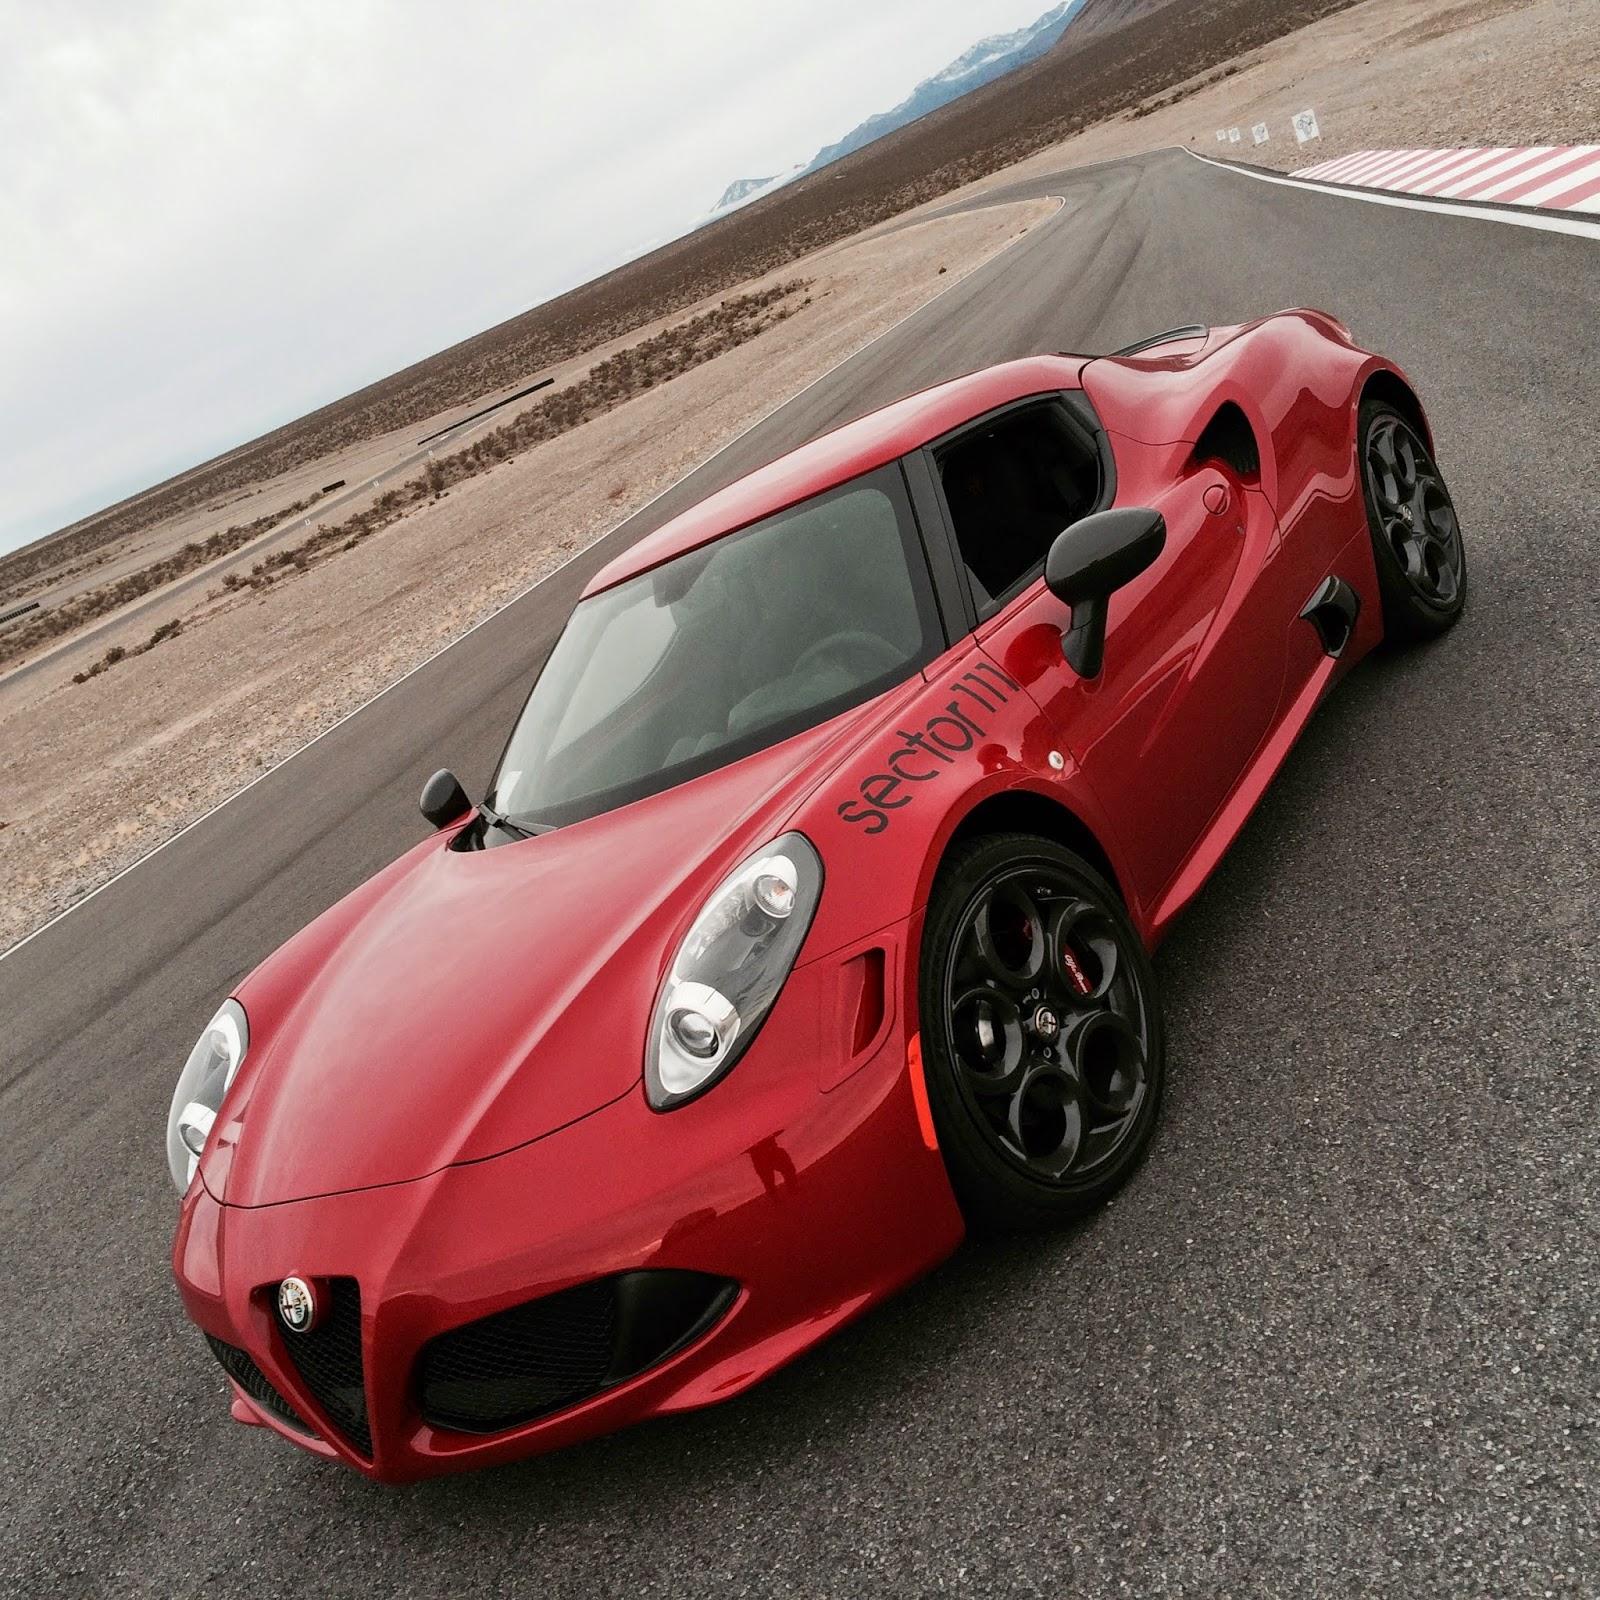 Sector111's Tasty Innovations Blog: Track Testing The Alfa